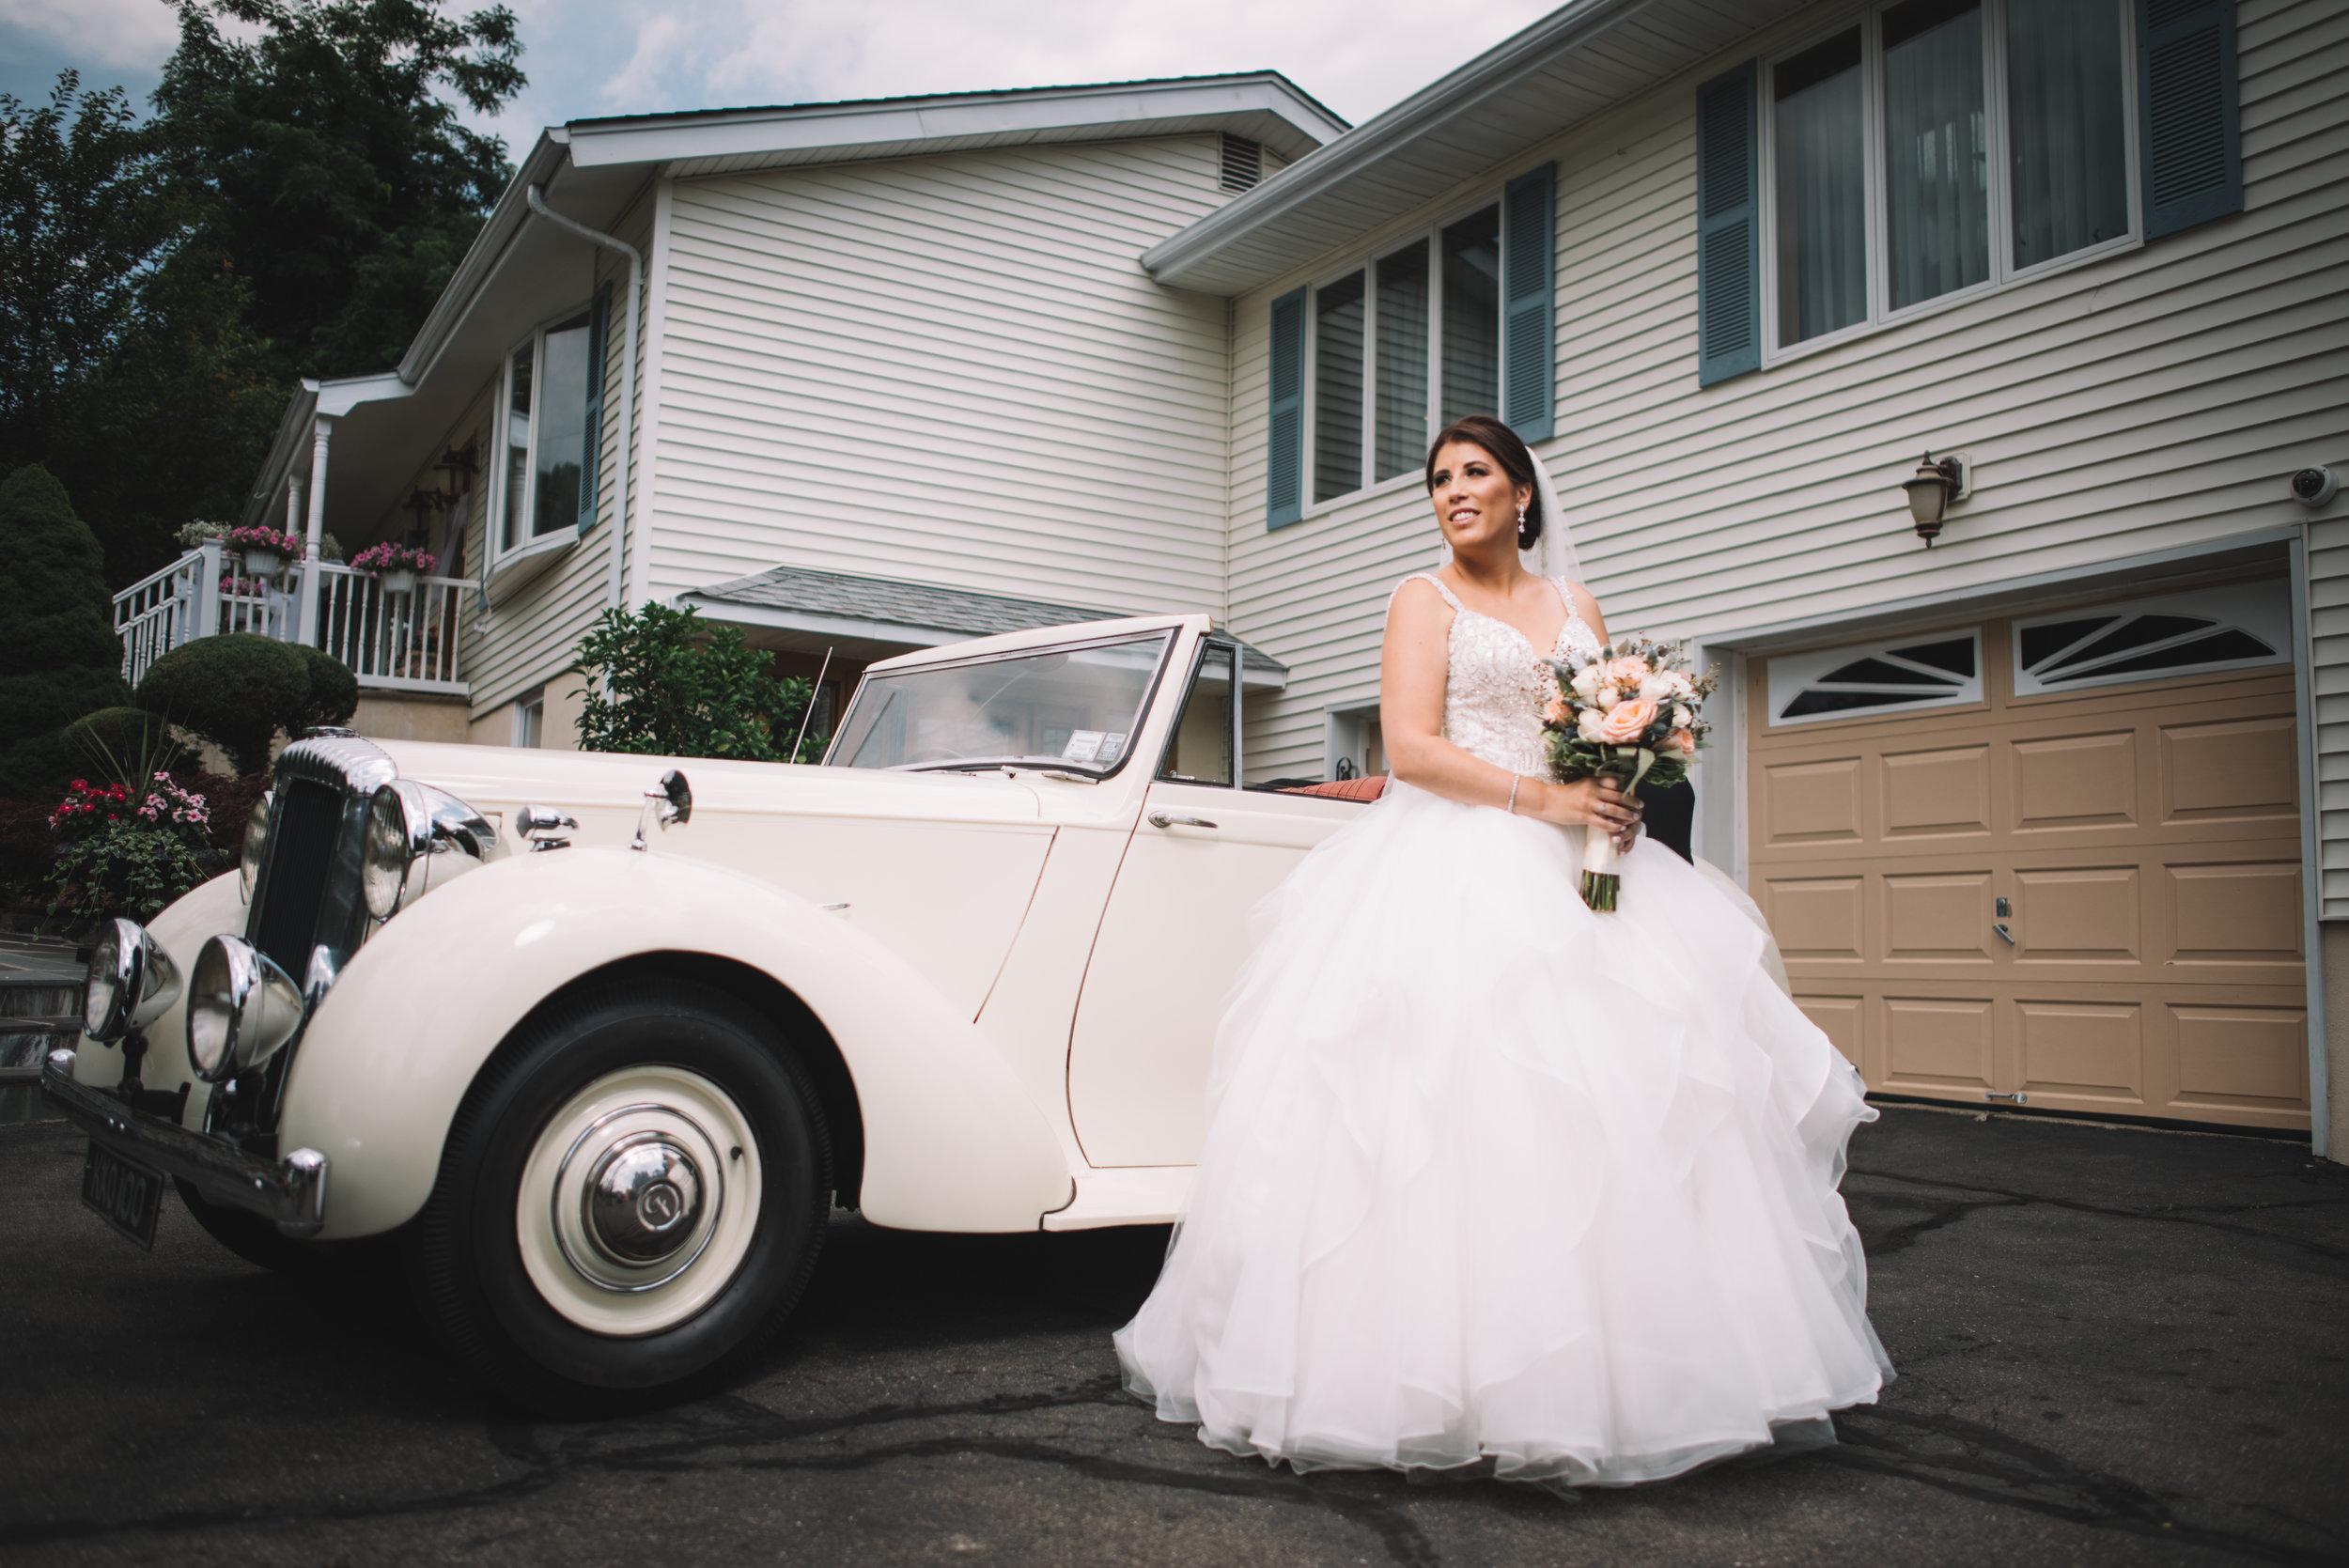 WeddingPhotos | NJPhotographer | Highlights-4-17.jpg